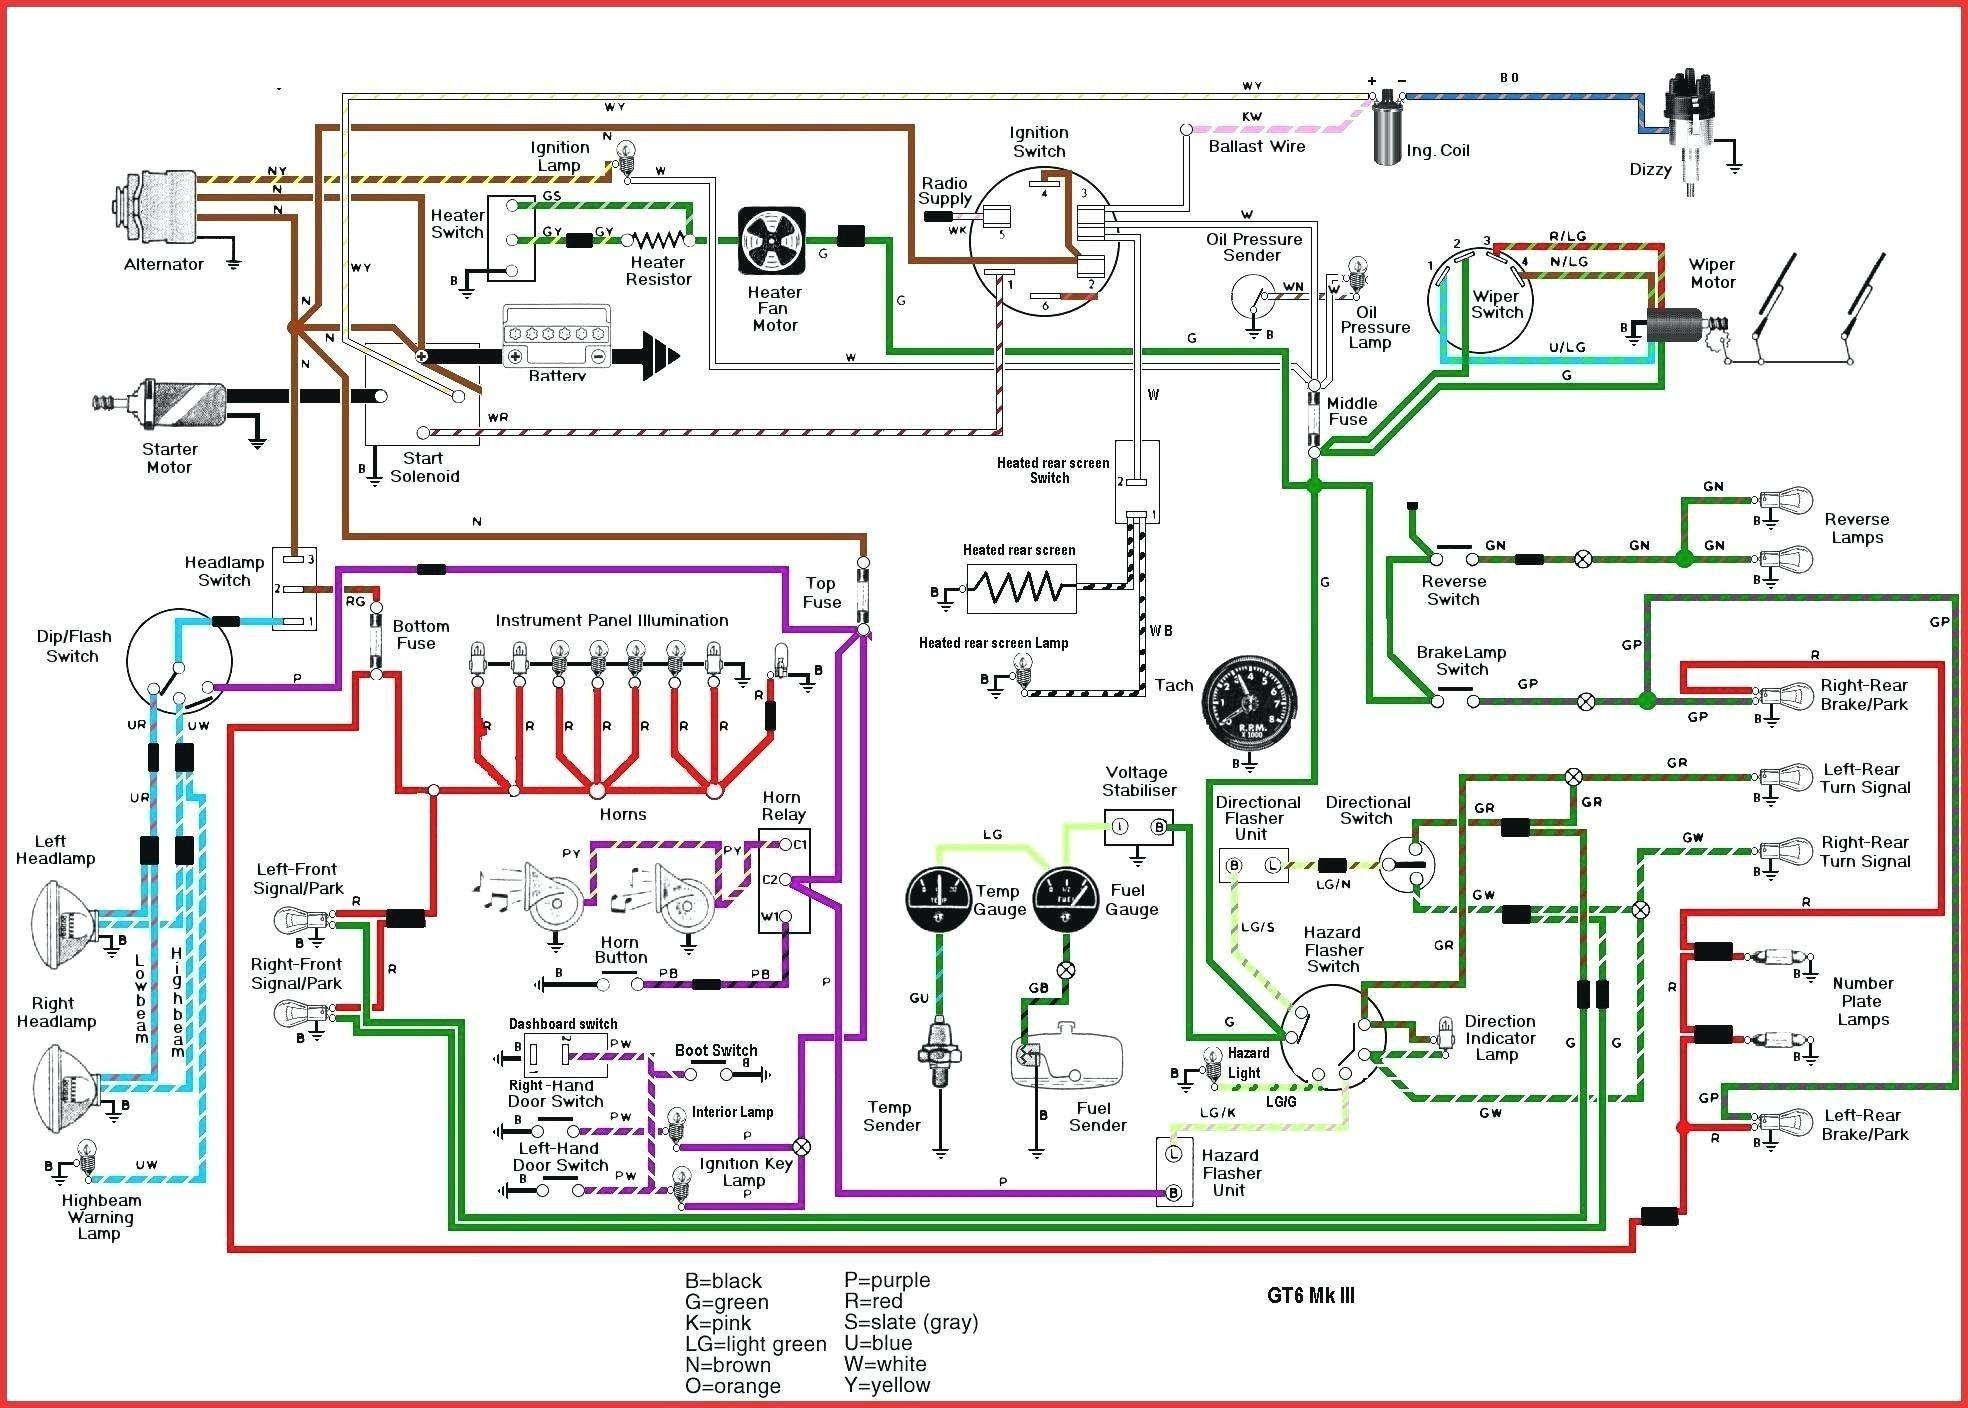 House Wiring Diagram Pdf Diagram Diagramsample Diagramtemplate Wiringdiagram